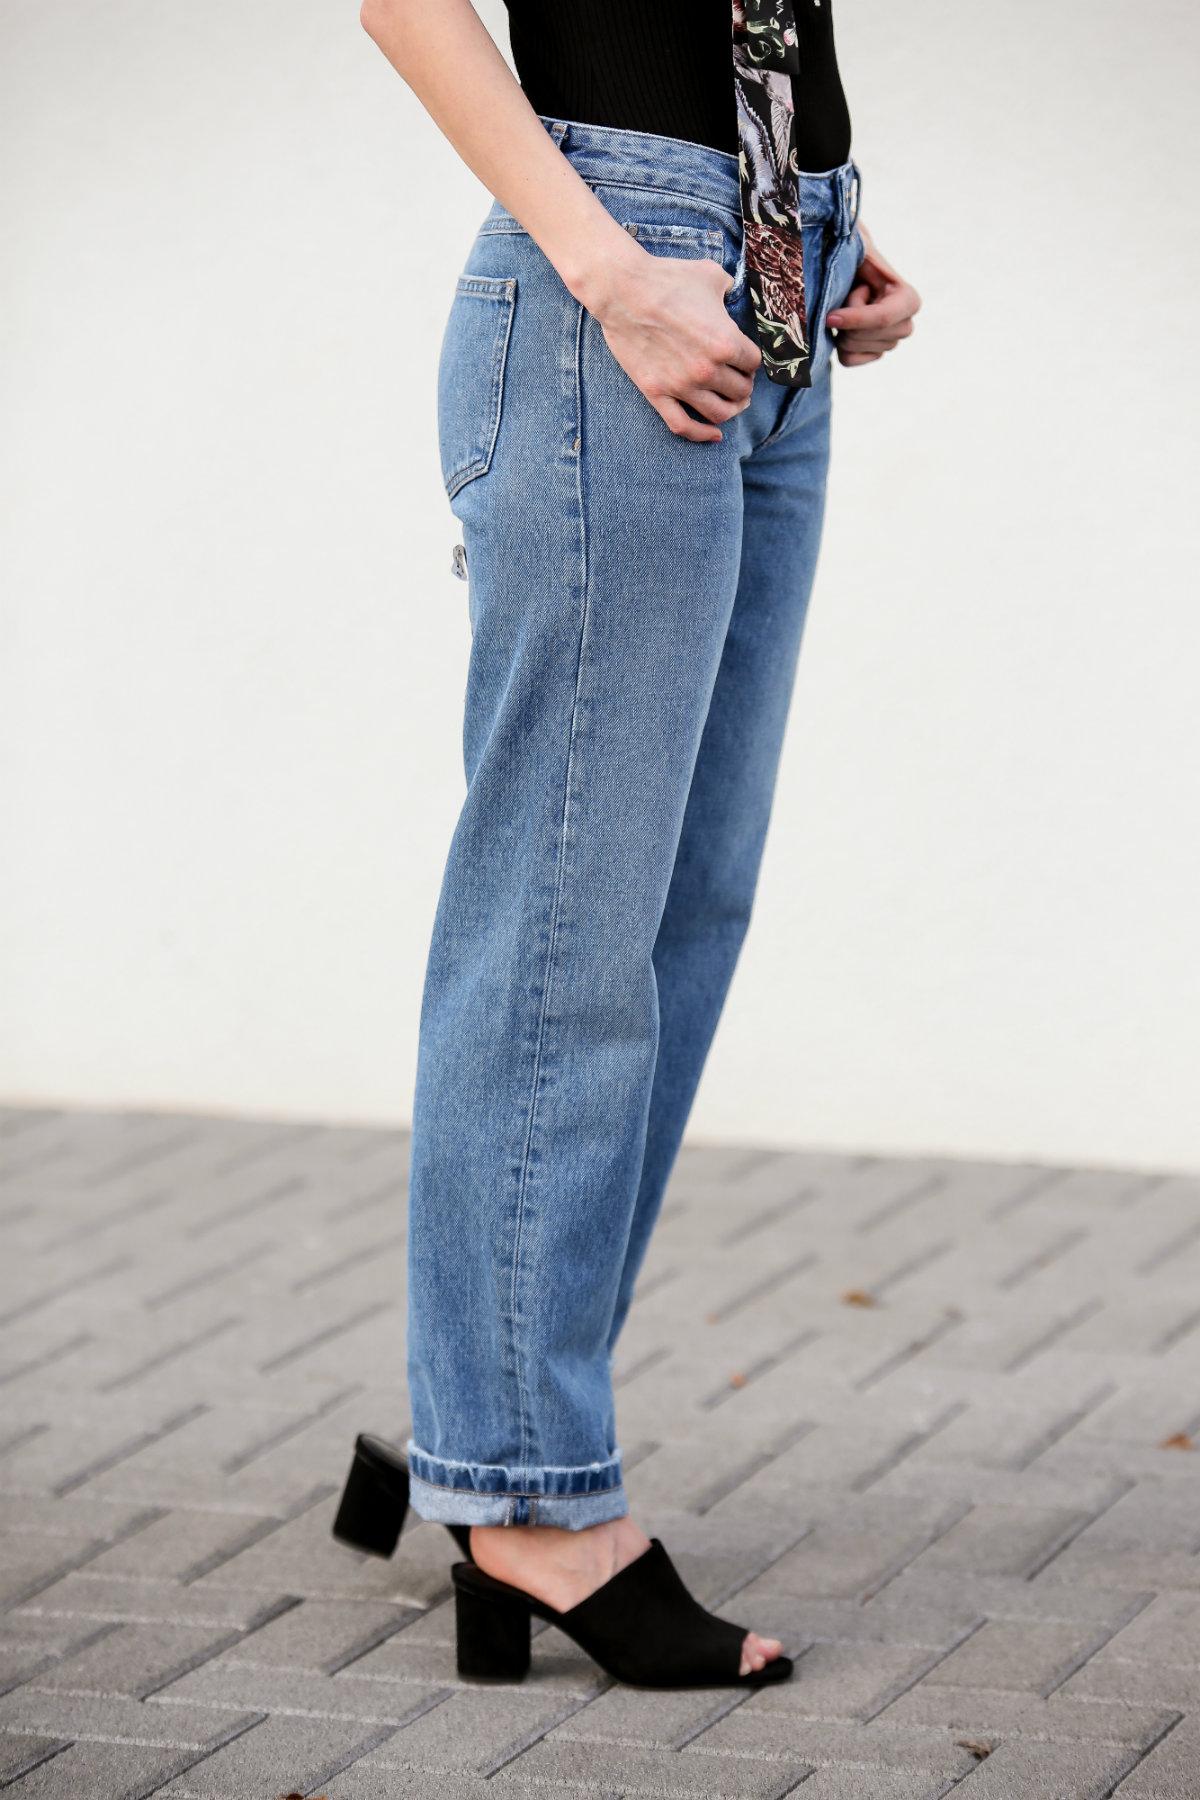 Fashion_Outfit_Zip_Zipper_Body_Valentino_Scarf-5_pixlr